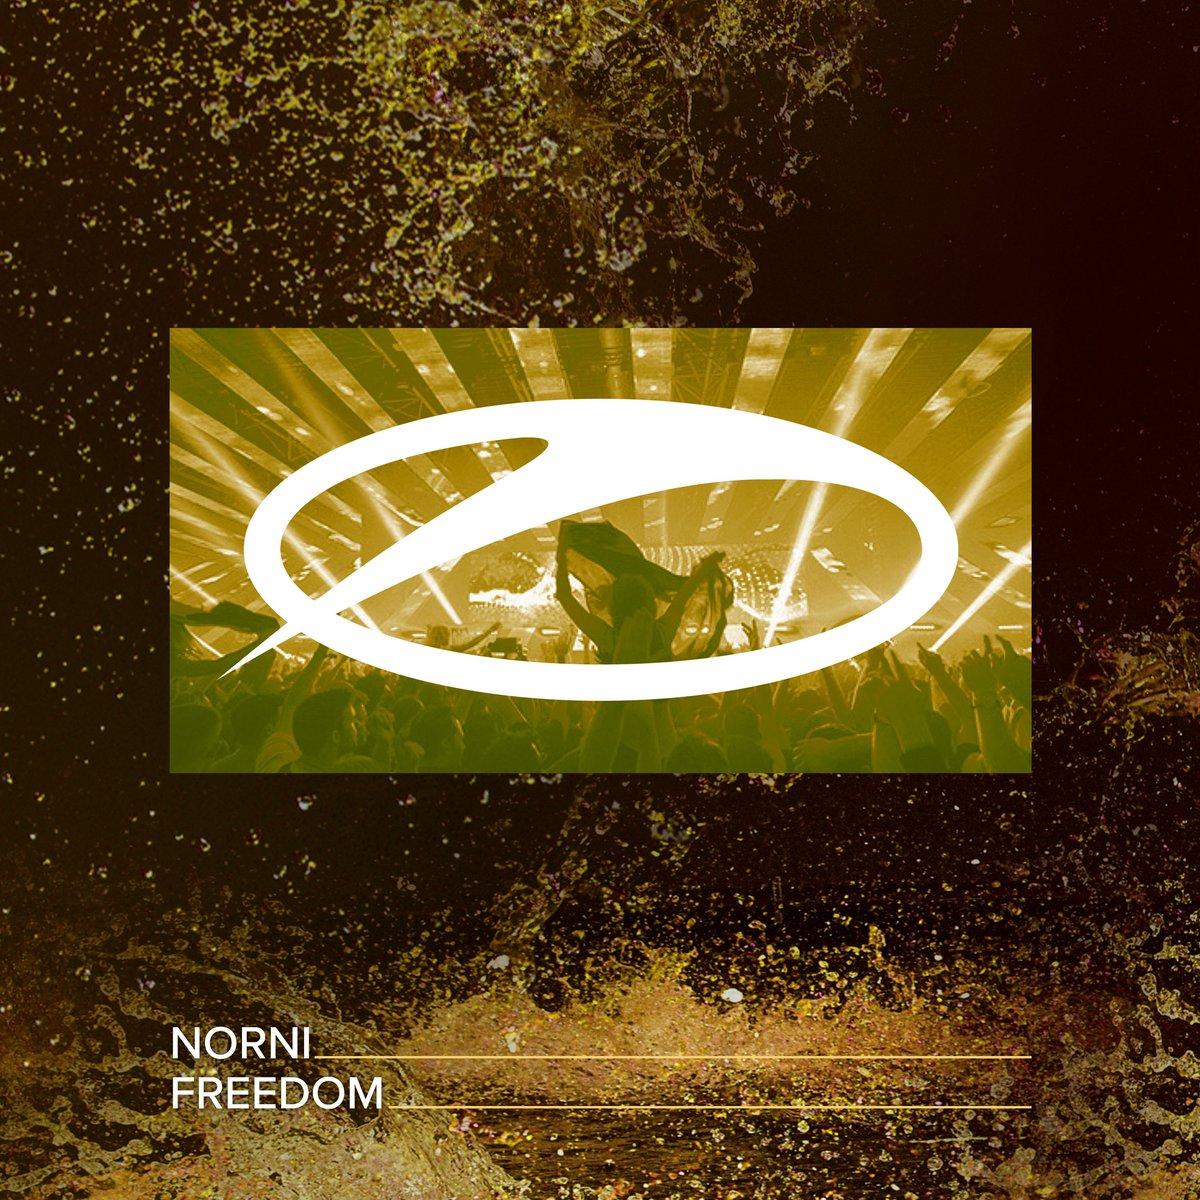 "The premiere of the video ""Freedom"" is already on YouTube! P.S. Link https://t.co/izgCzCXPpR  #trance #trancefamily #progressivehouse #progressivetrance #norni #nornimusic #edm #edmmusic #edmfamily #asot #arminvanbuuren  #armada #armind #Freedom https://t.co/wKiX9eELWV"